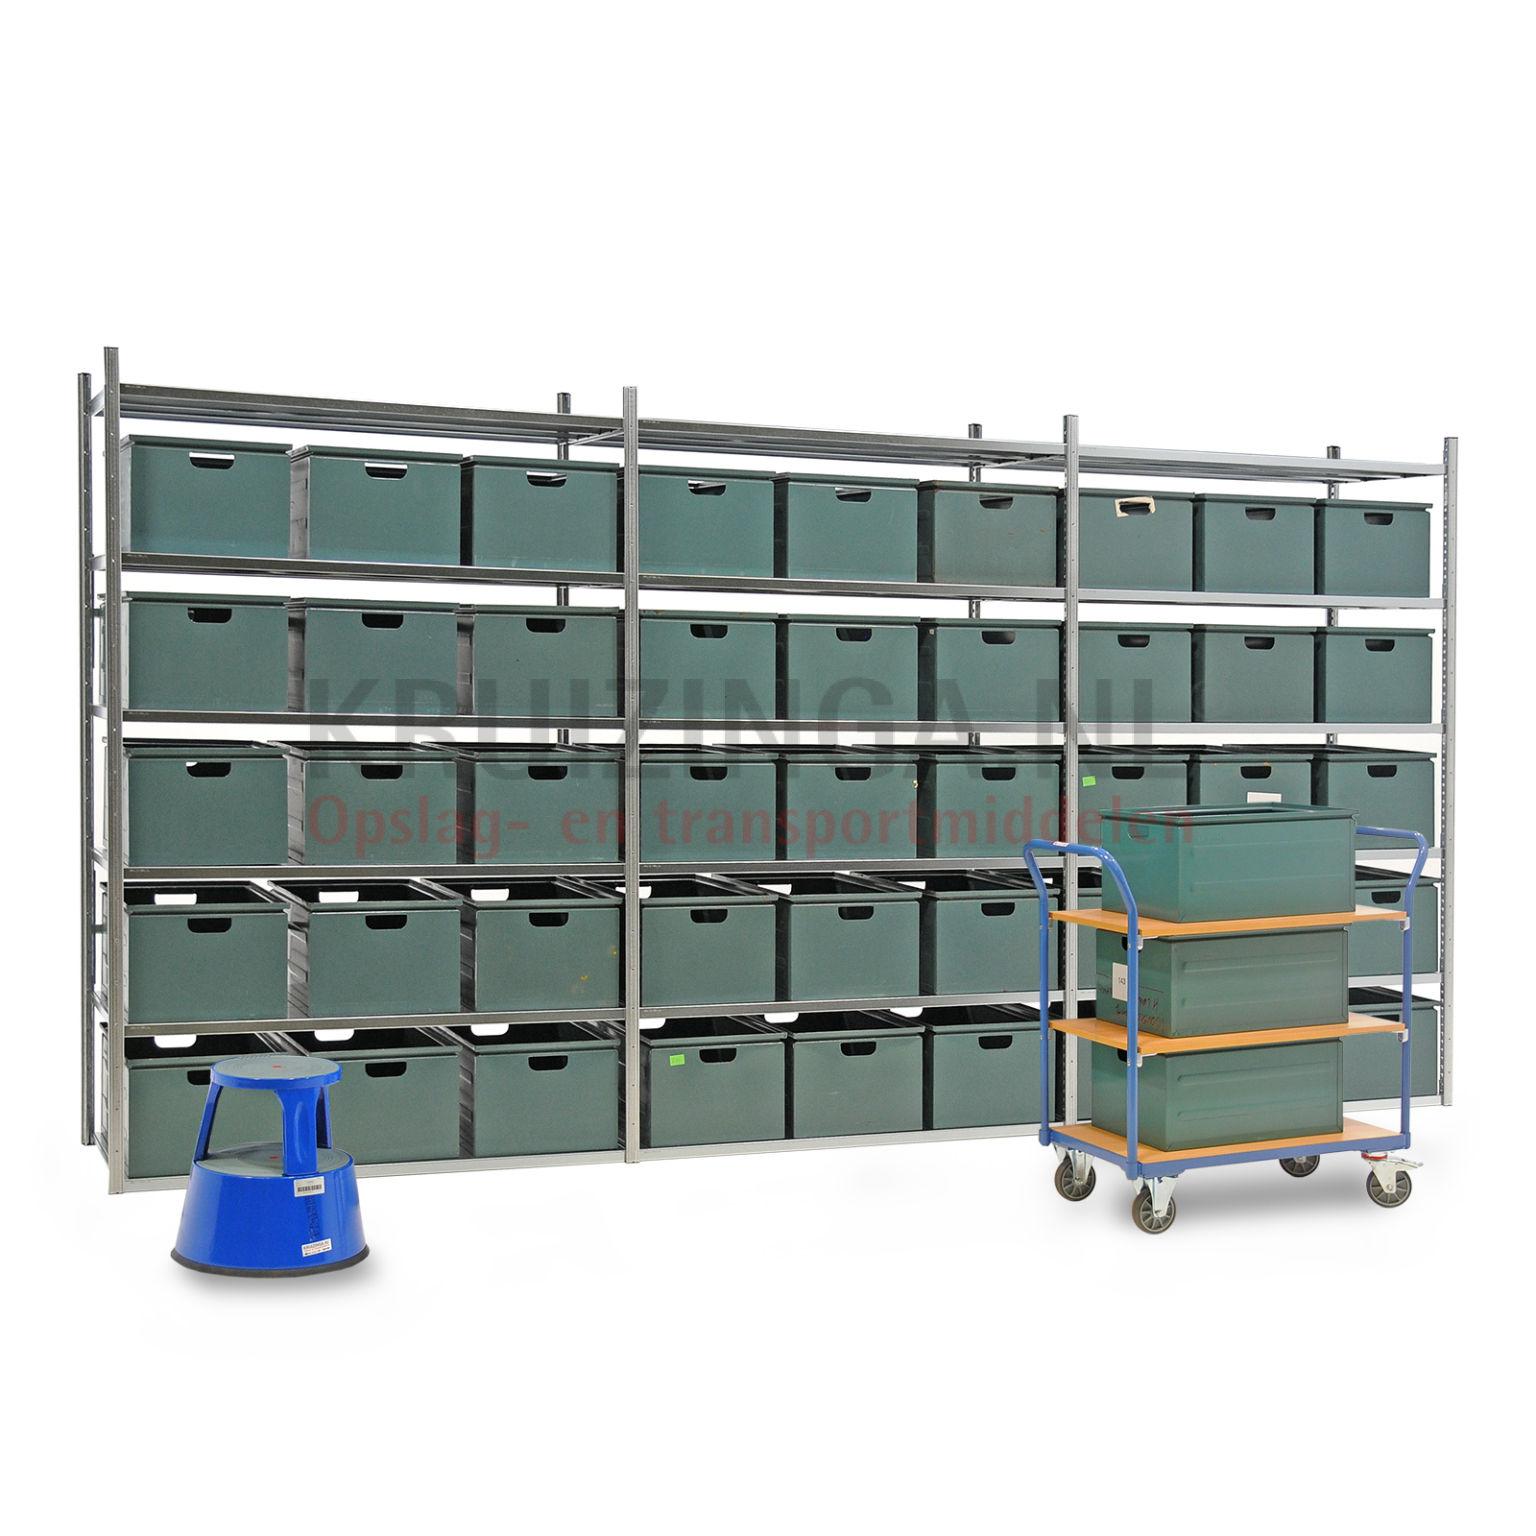 kombination satz regale kombination satz fachbodenregal inkl 45 stapelboxen gebraucht ab 756. Black Bedroom Furniture Sets. Home Design Ideas